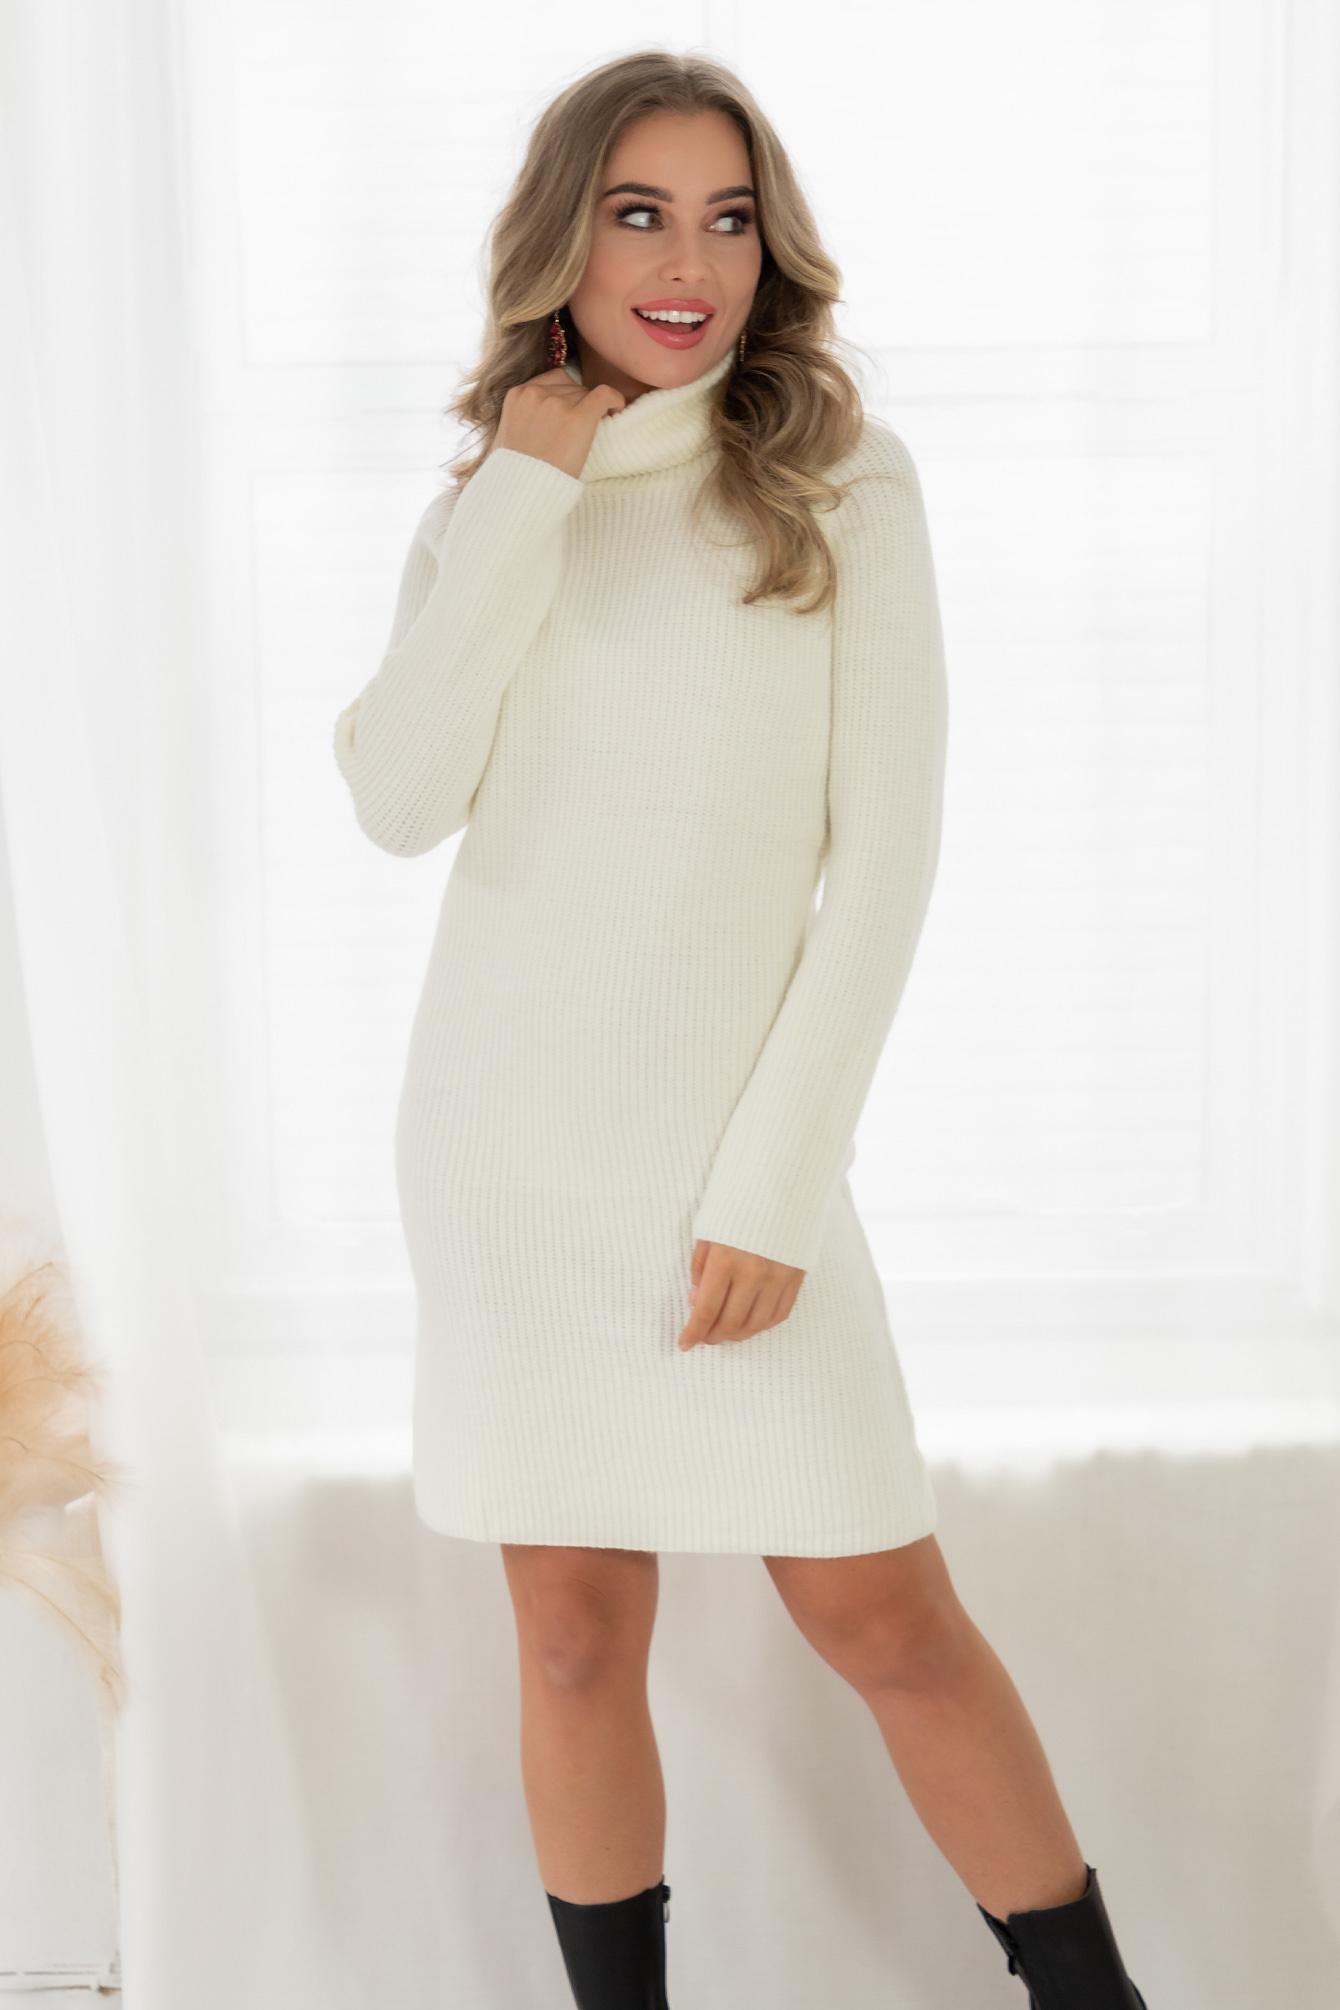 Sweater dress off white Mandy